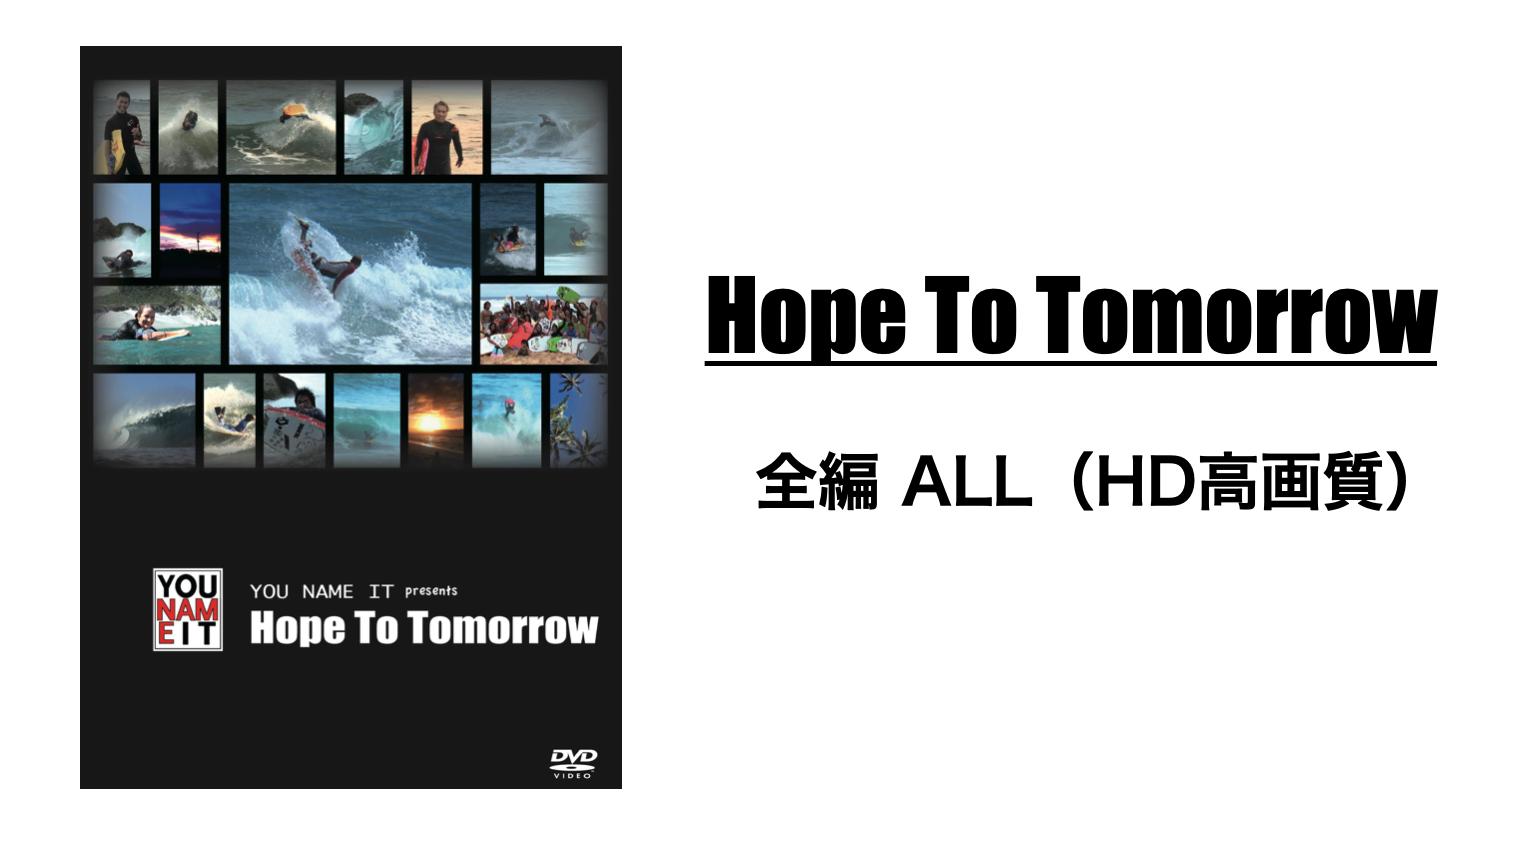 Hope To Tomorrow 全編(HD高画質)